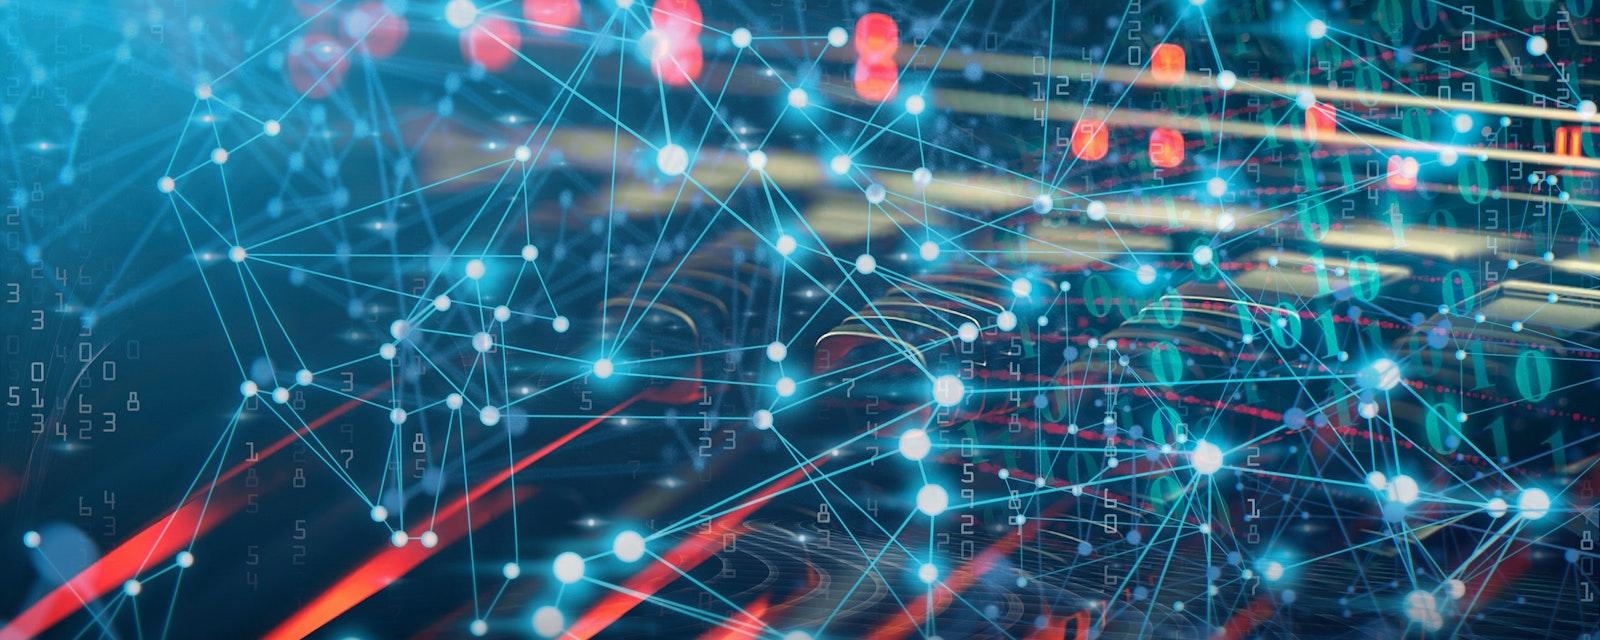 Block,Chain,,Security,System,,Data,Transformation,,Big,Data,,Iot,,Data